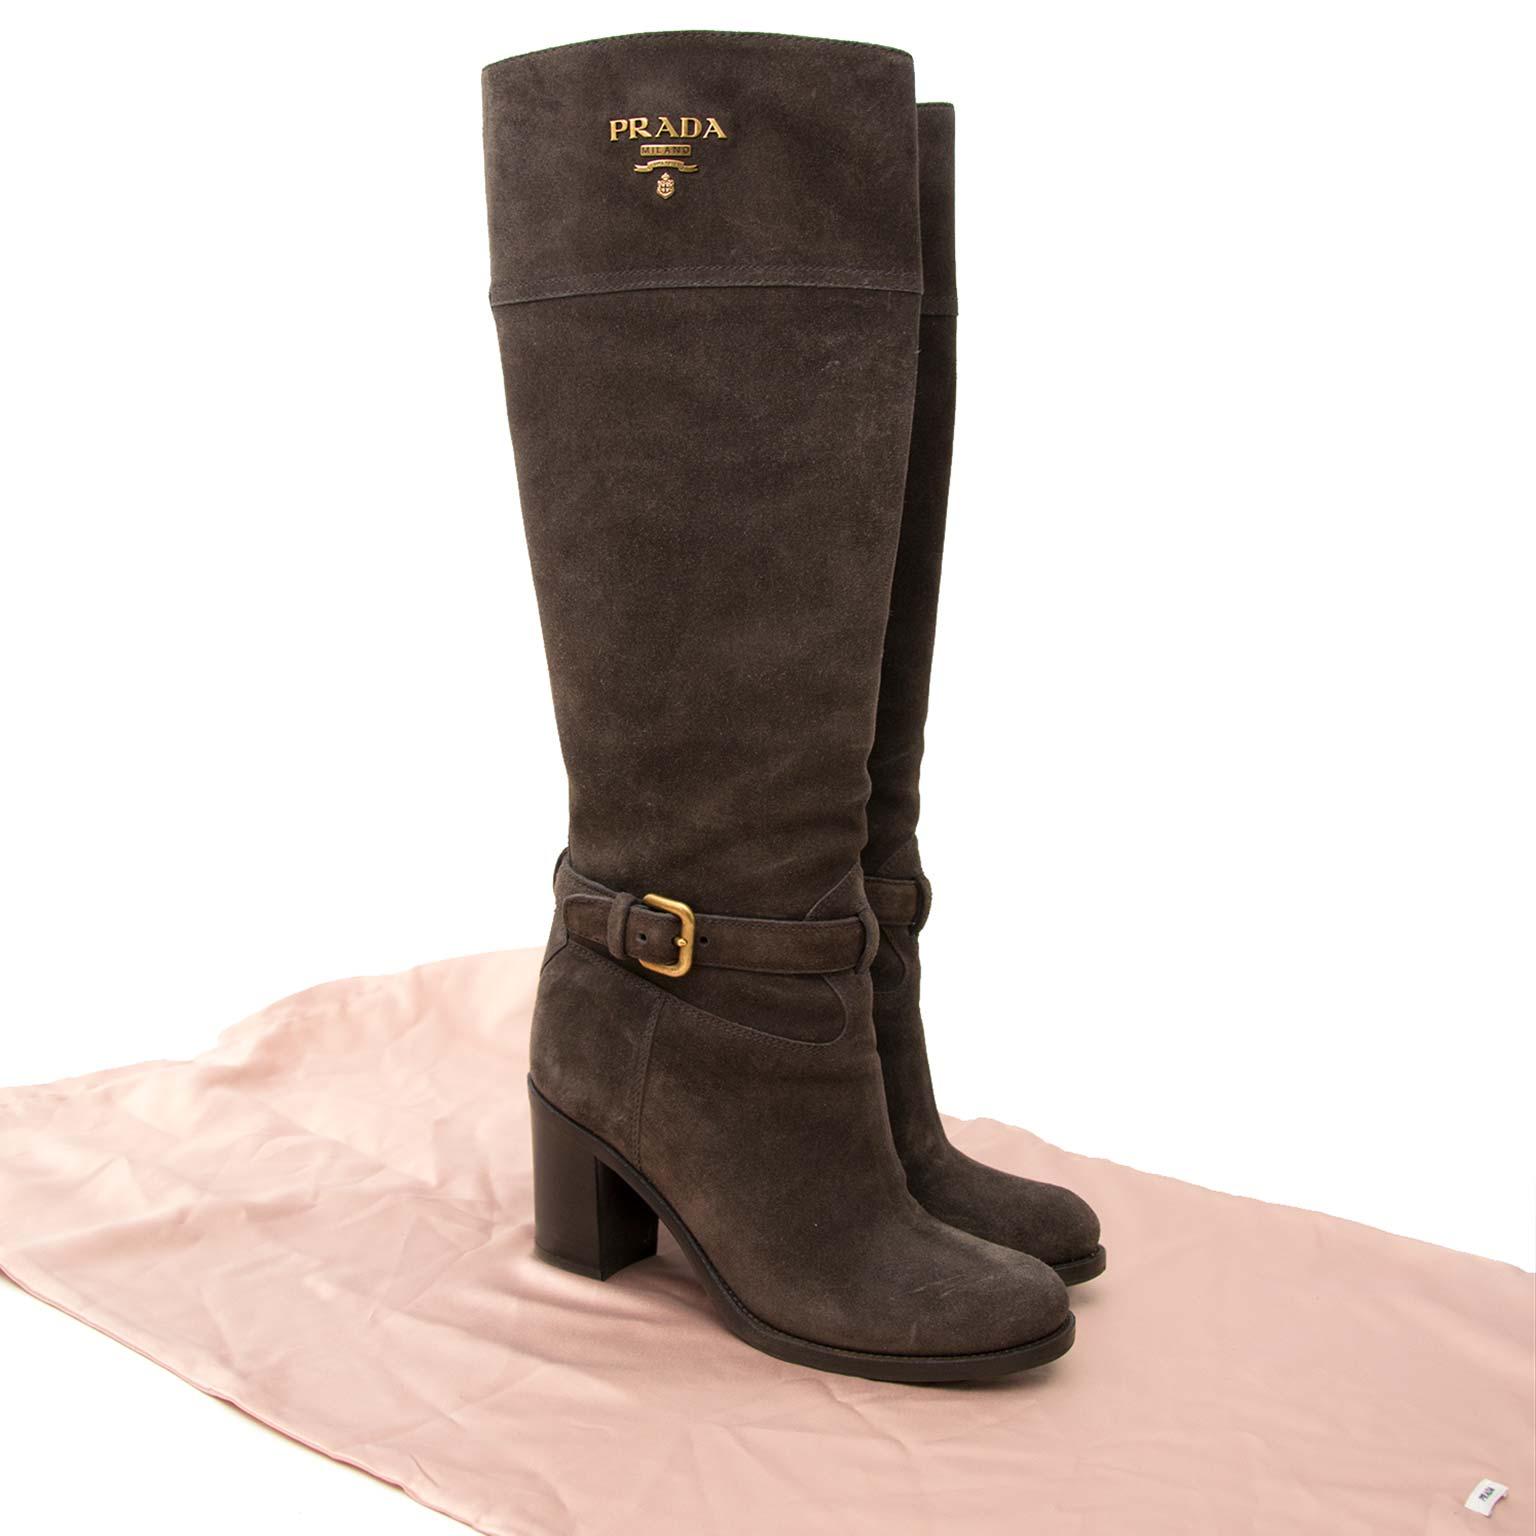 Prada Grey Suede Buckle Detail Boots